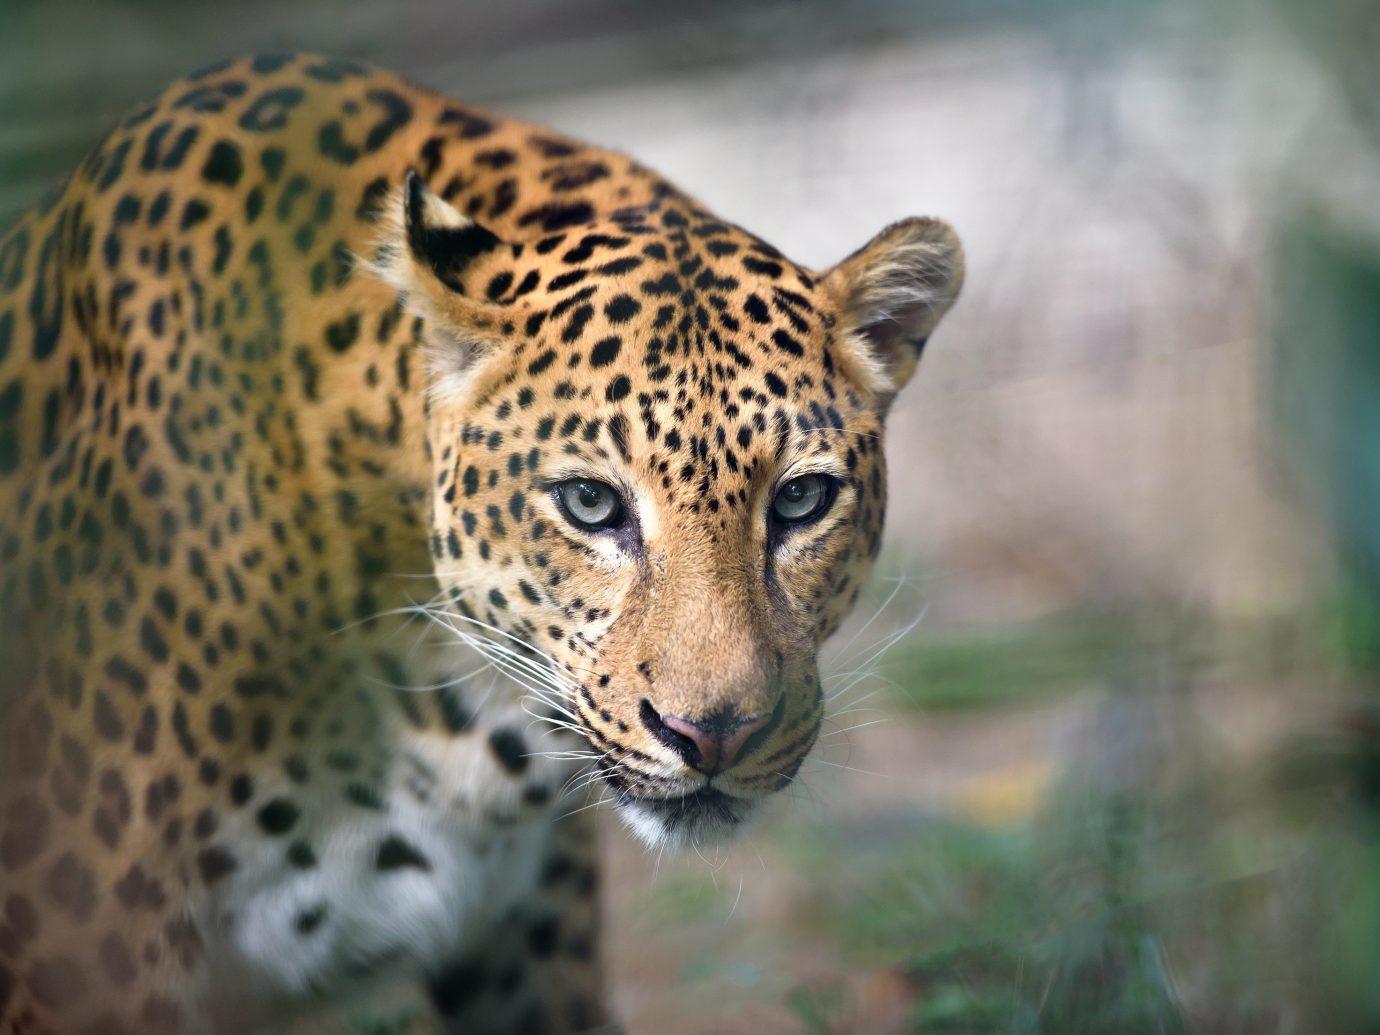 Budget big cat mammal animal jaguar leopard Wildlife vertebrate outdoor fauna standing whiskers cat like mammal big cats Safari zoo